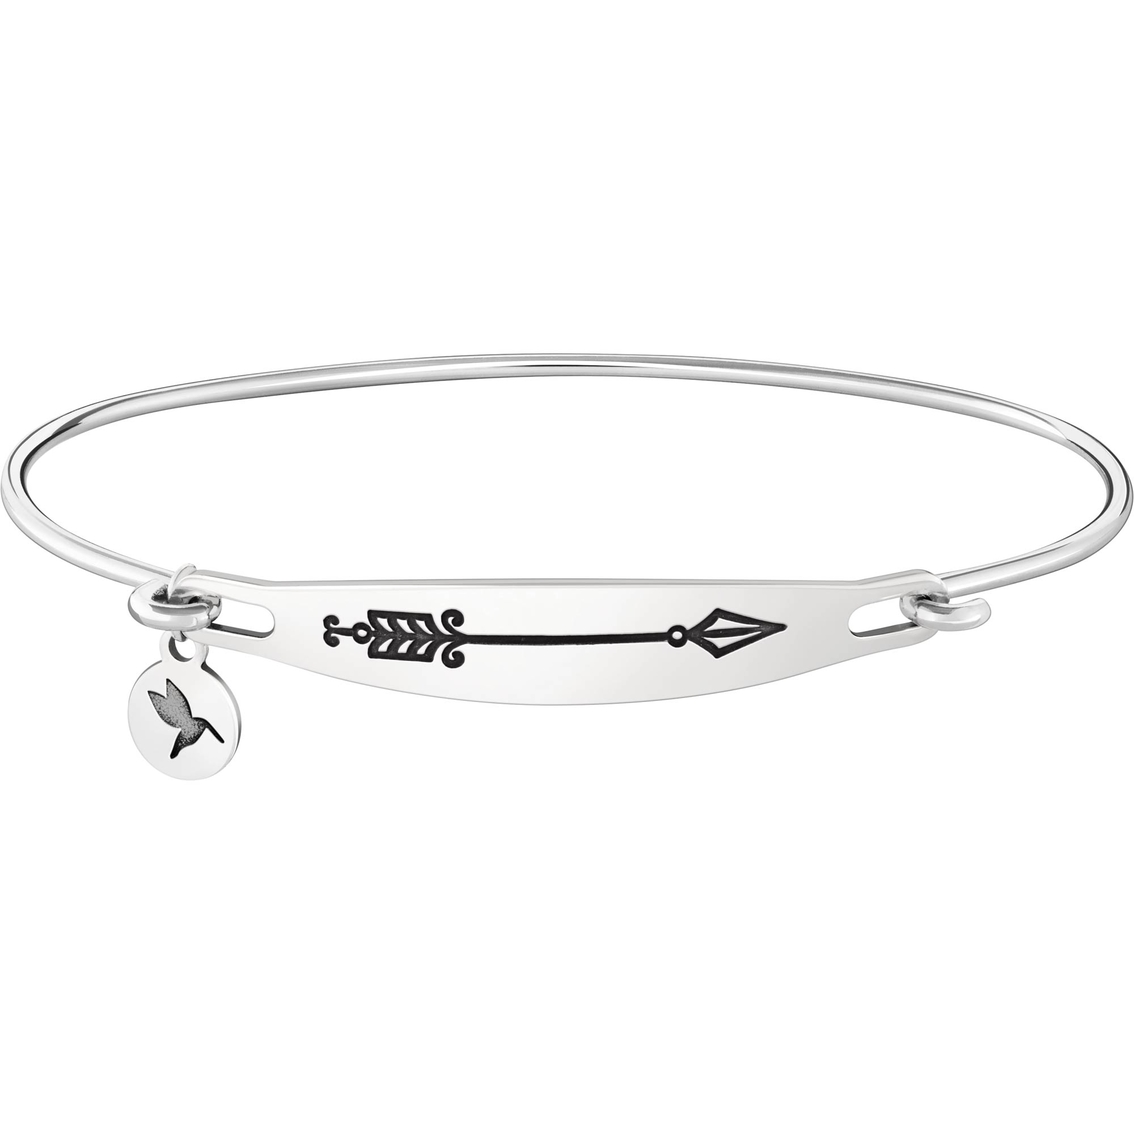 Chamilia Arrow Id Bangle Bracelet